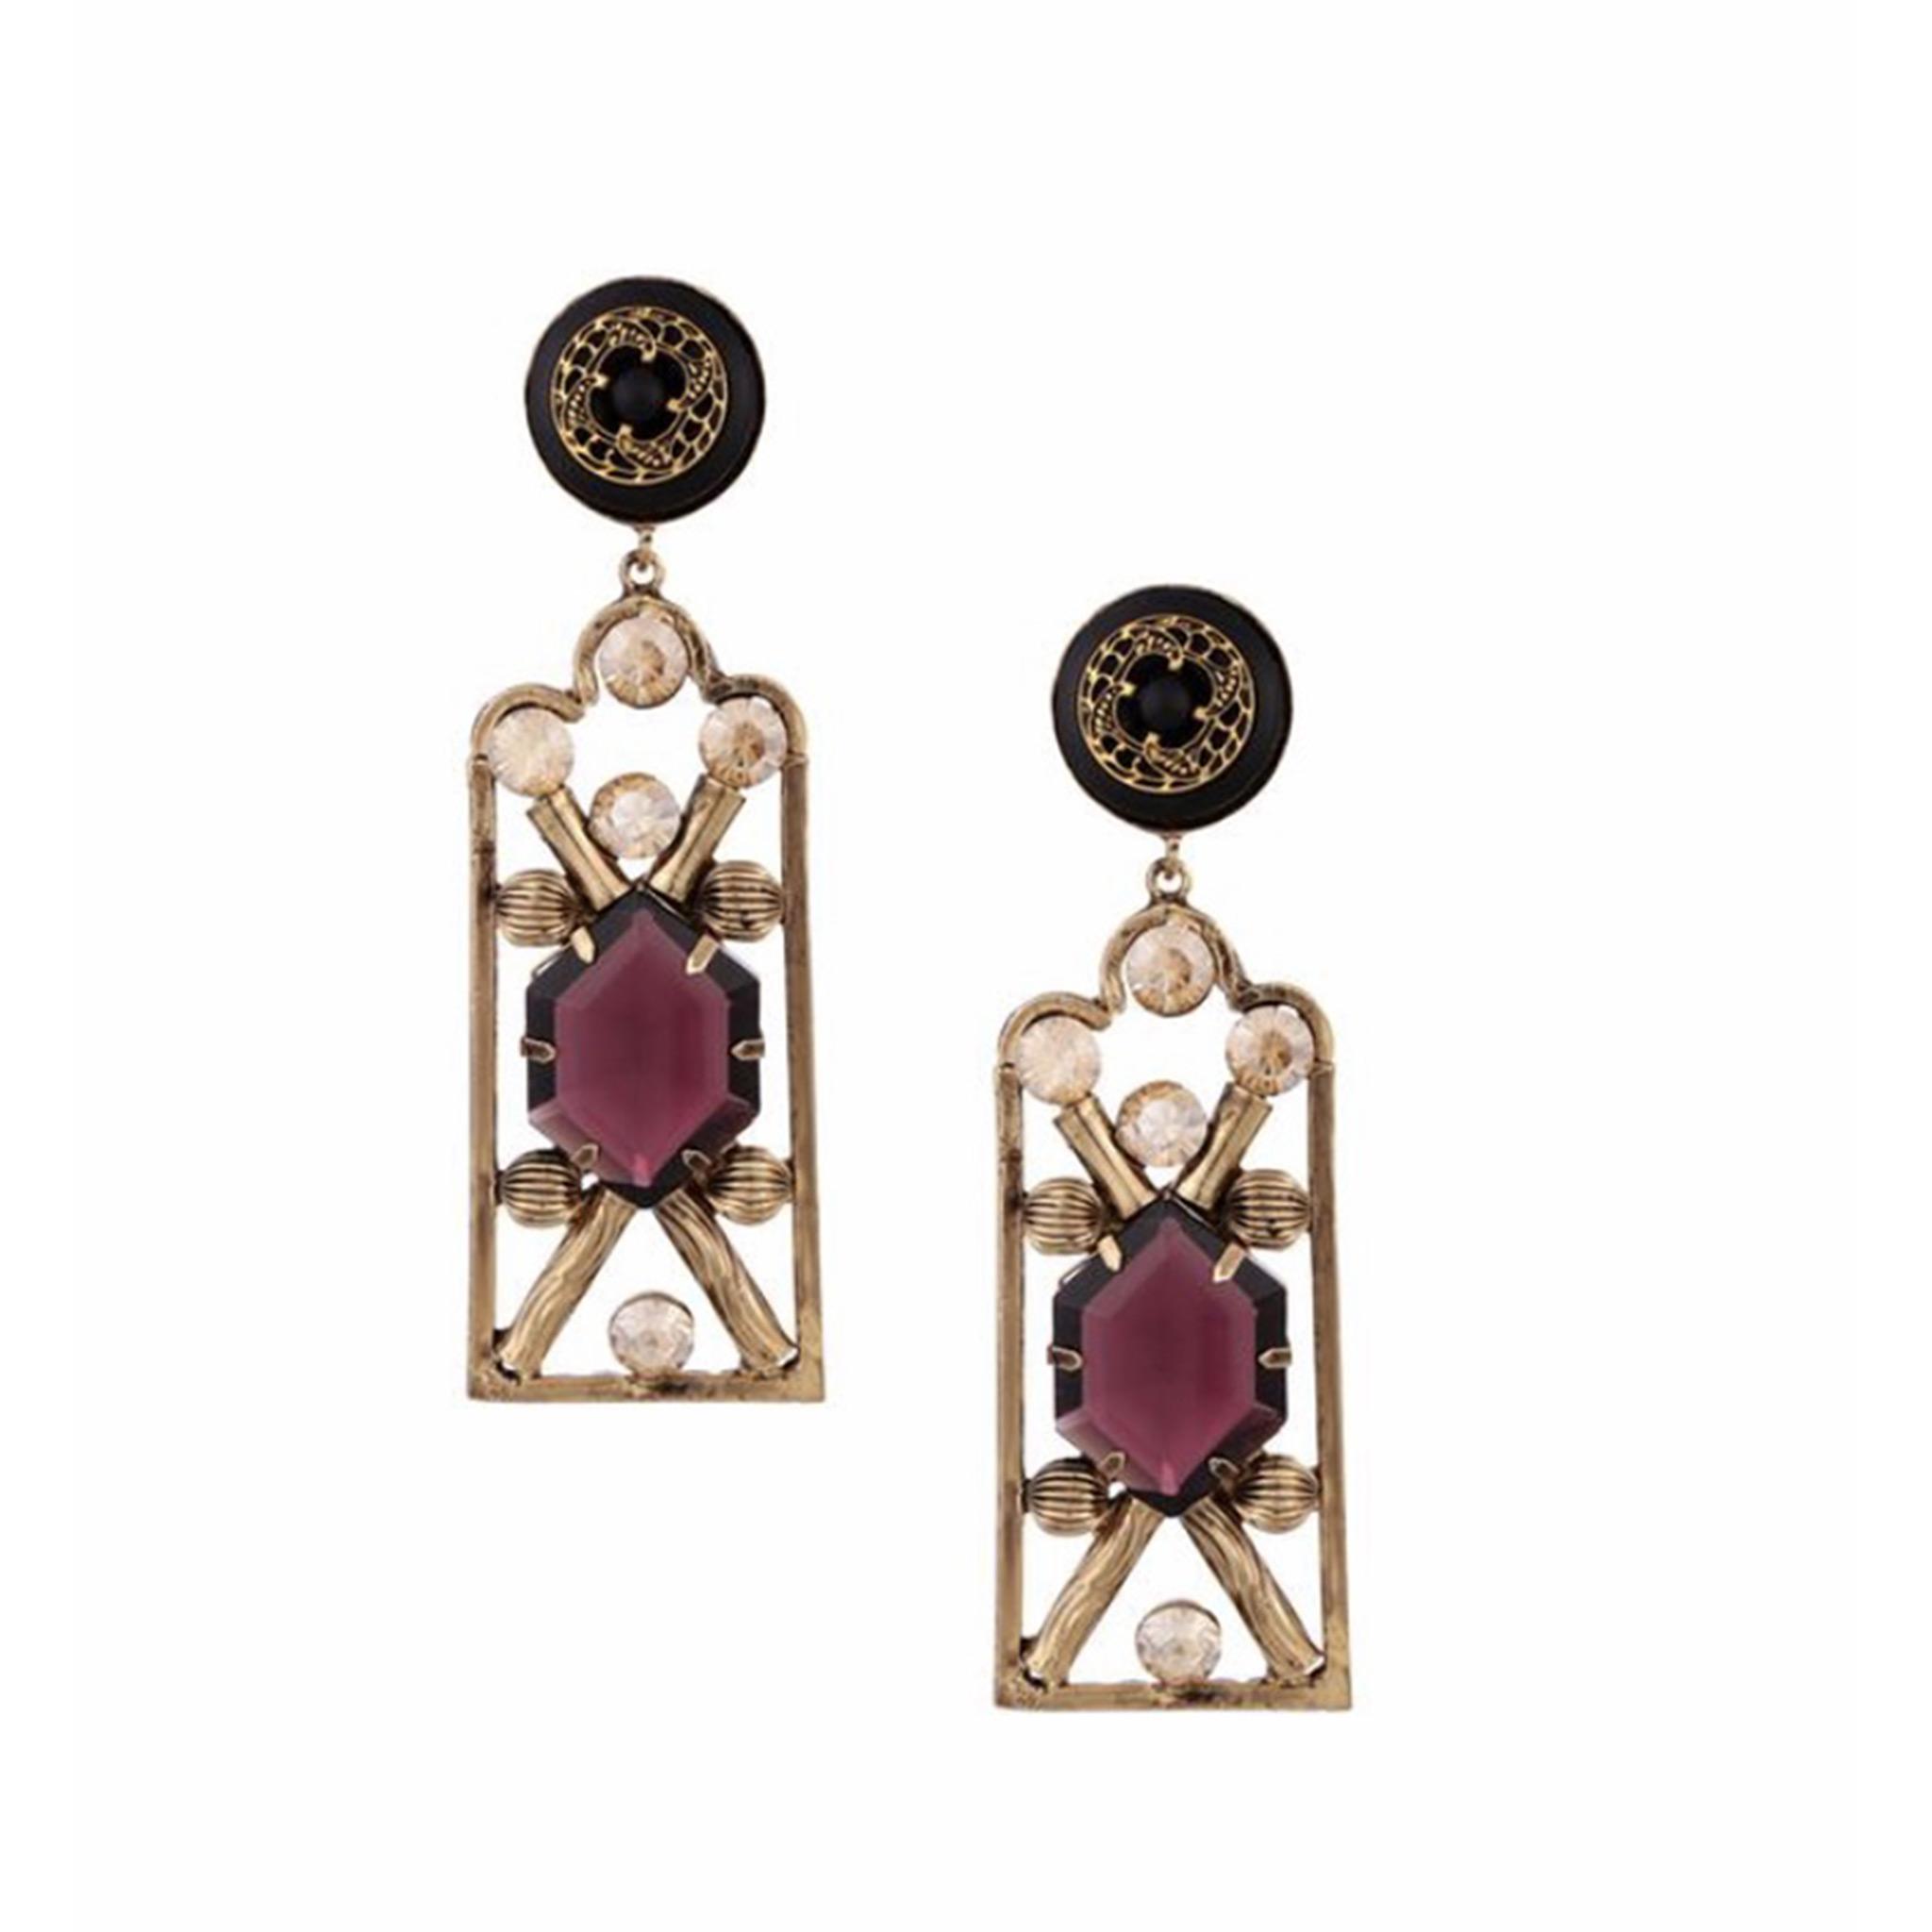 Valliyan Nitya Arora Copper Plated Nausheen Earrings